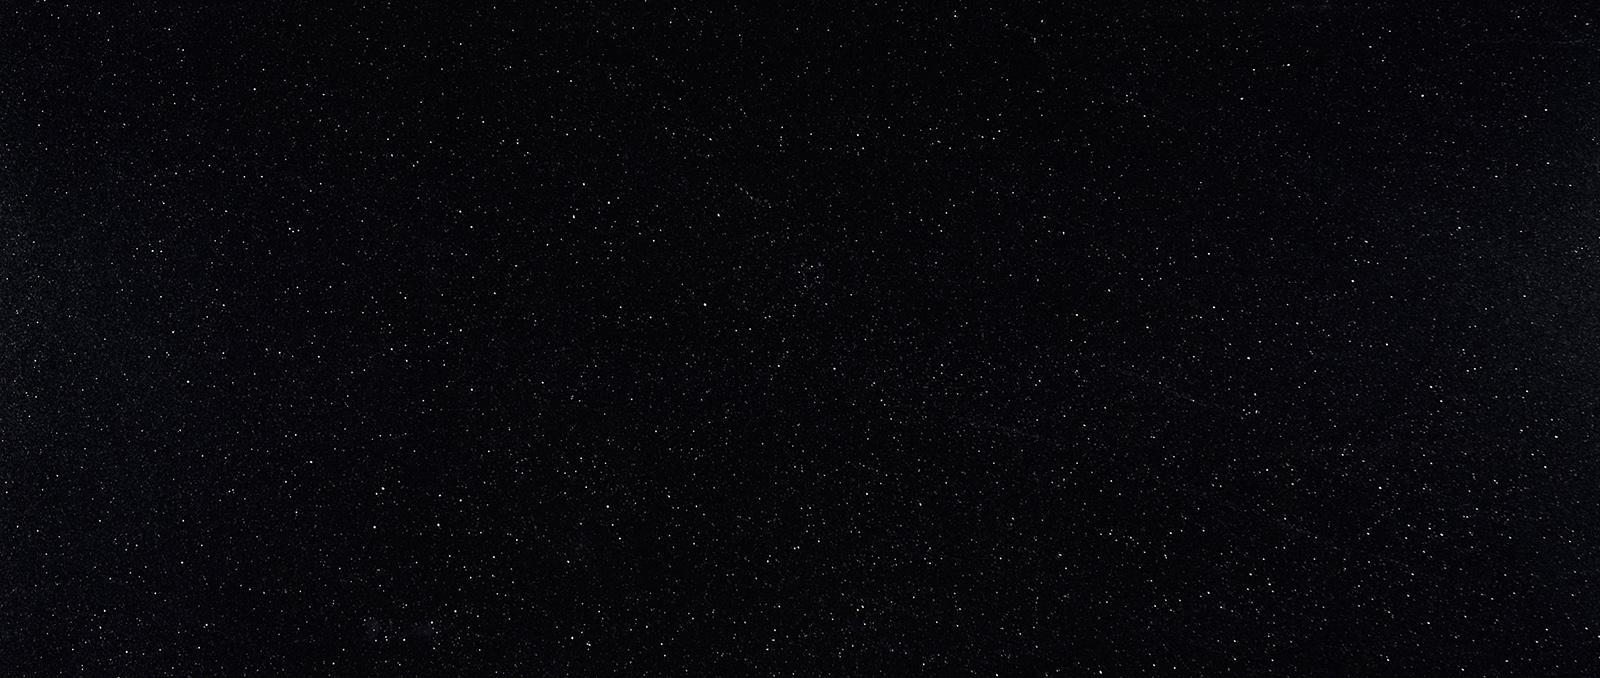 vreaupiatra-granit-negru-galaxy-banner